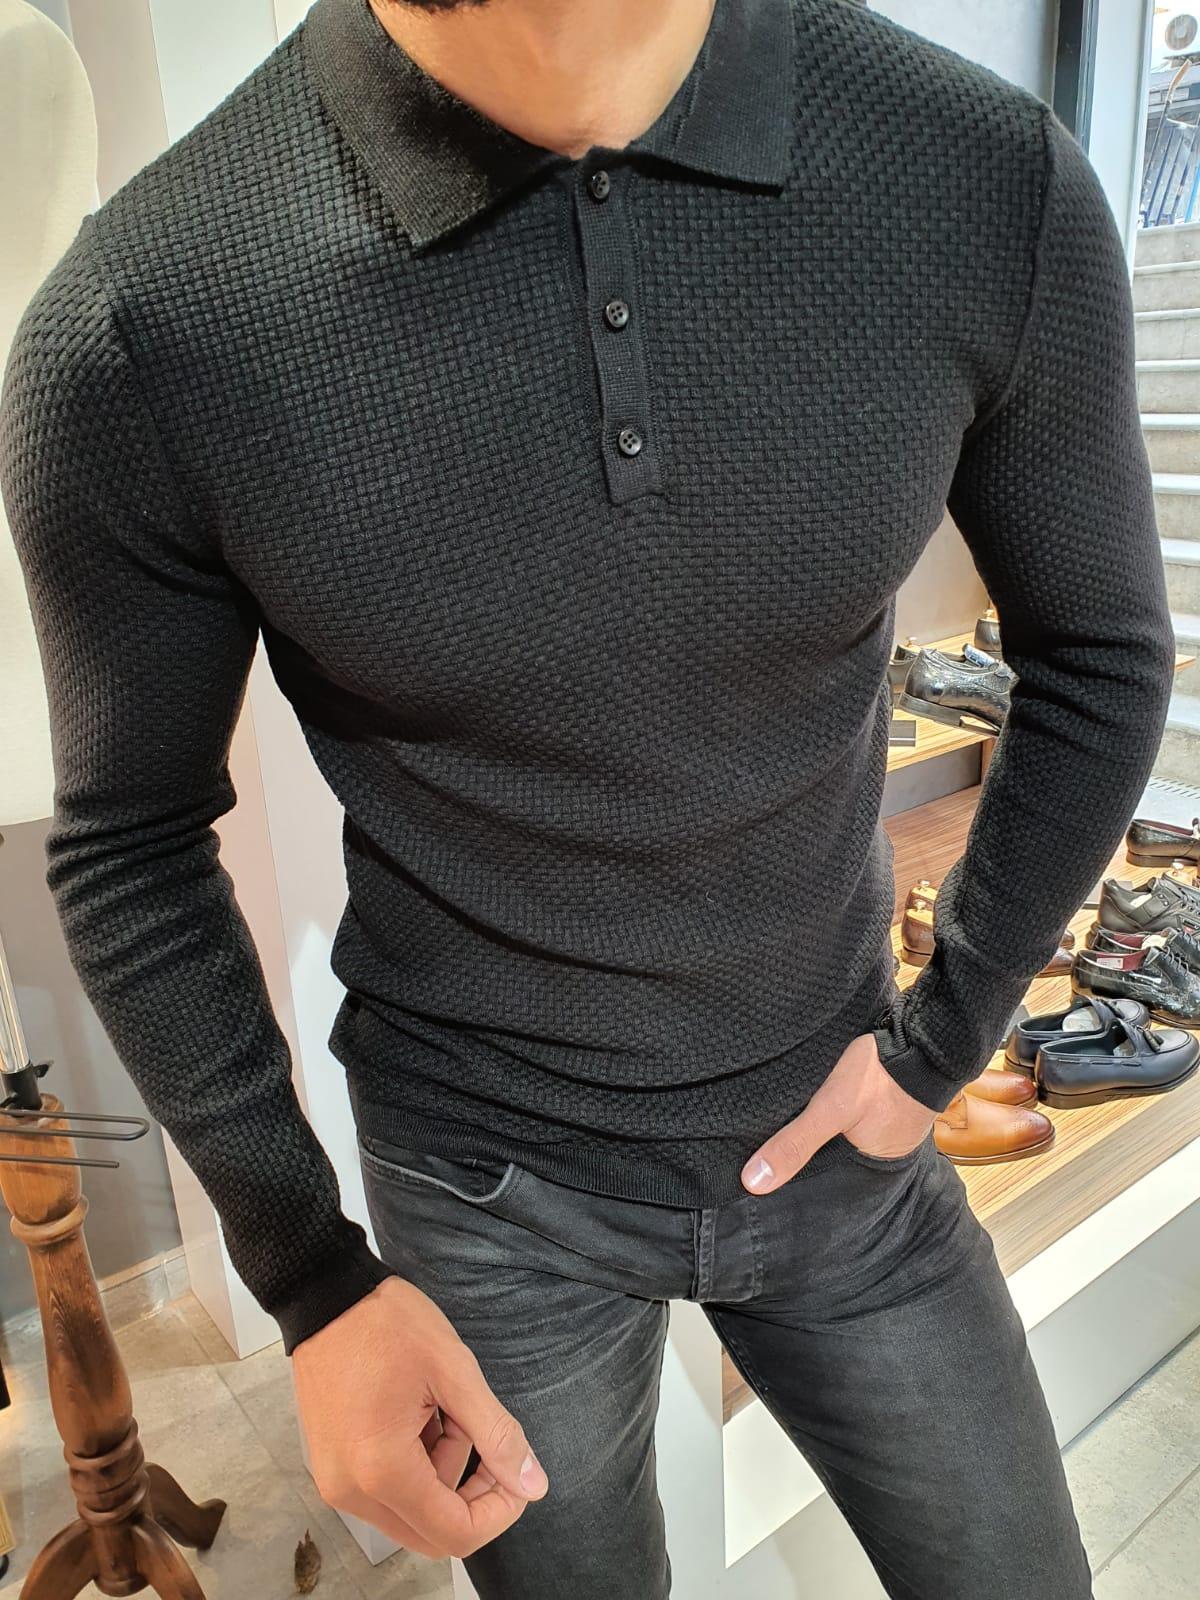 Slim-Fit polo collar knitwear sweater black